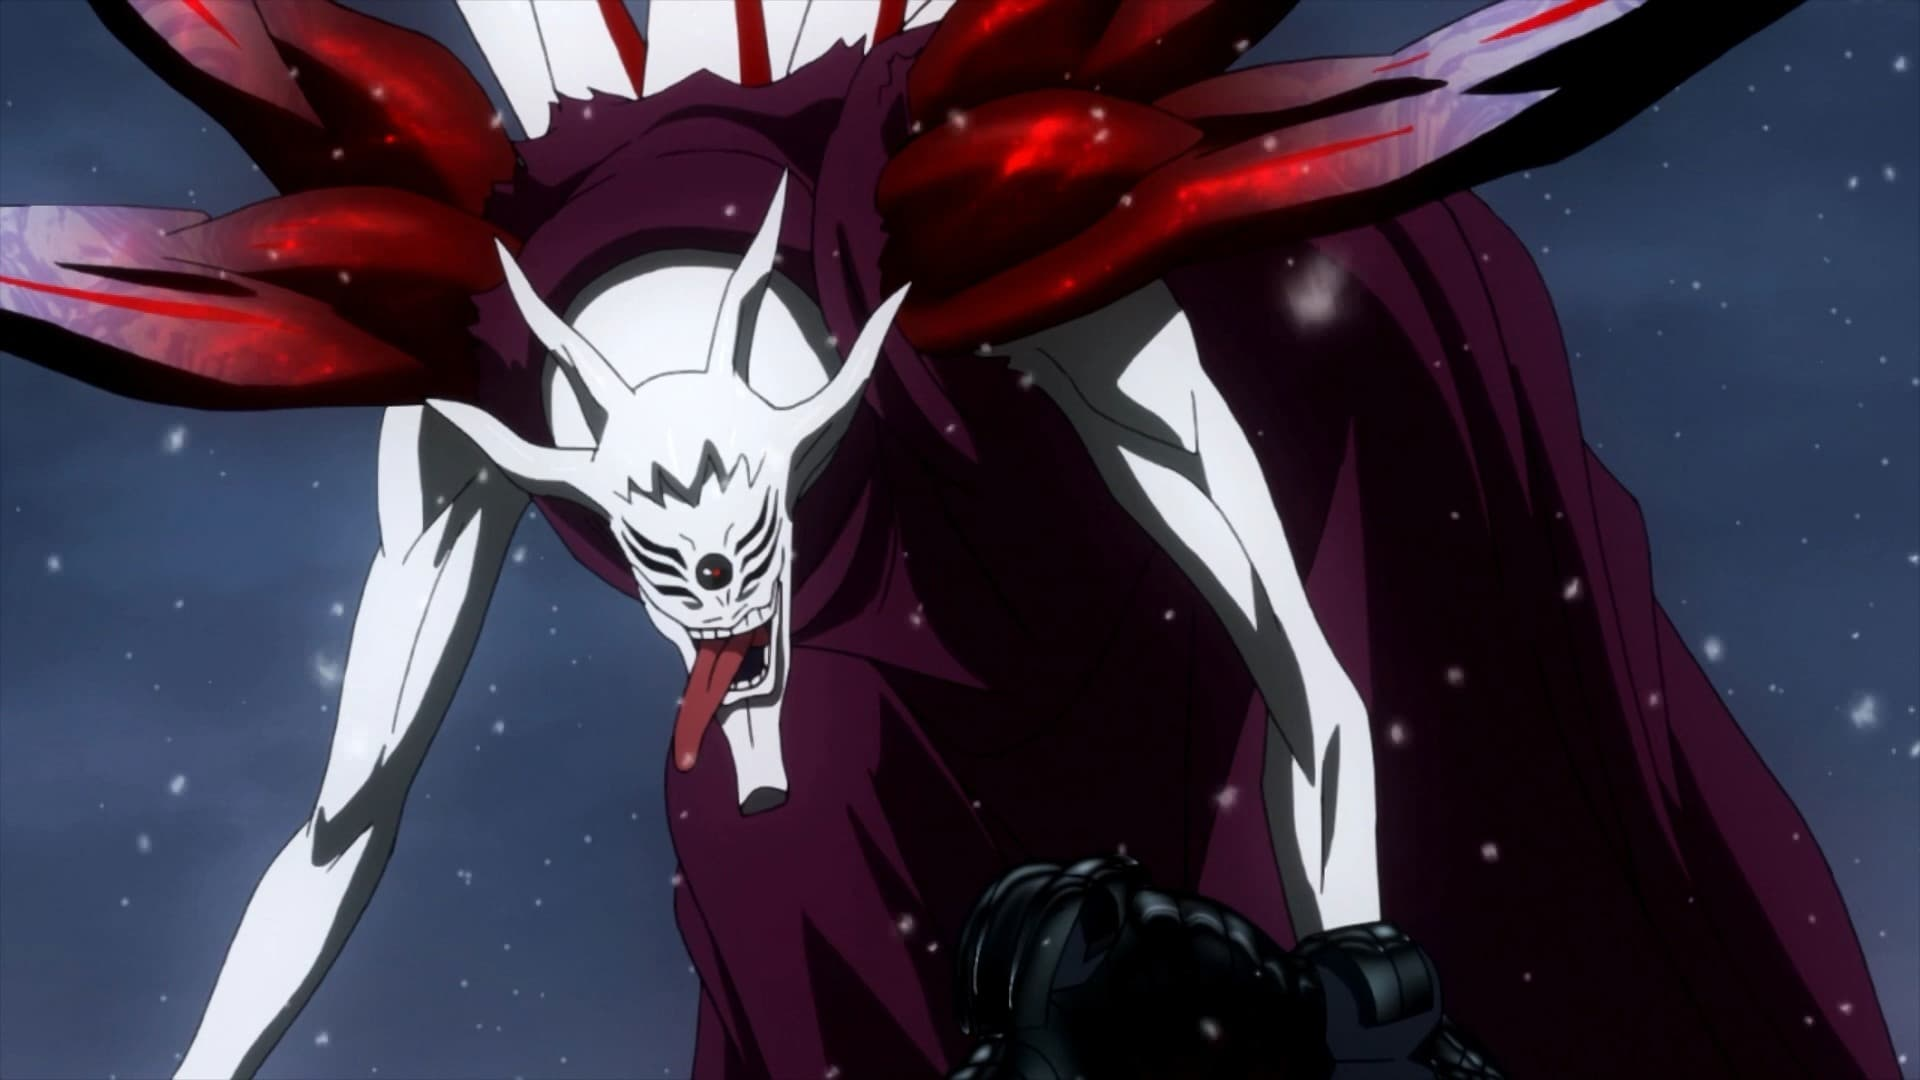 anime tokyo ghoul 1 temporada online: Ver Tokyo Ghoul: Temporada 2 Capitulo 11 Online Gratis